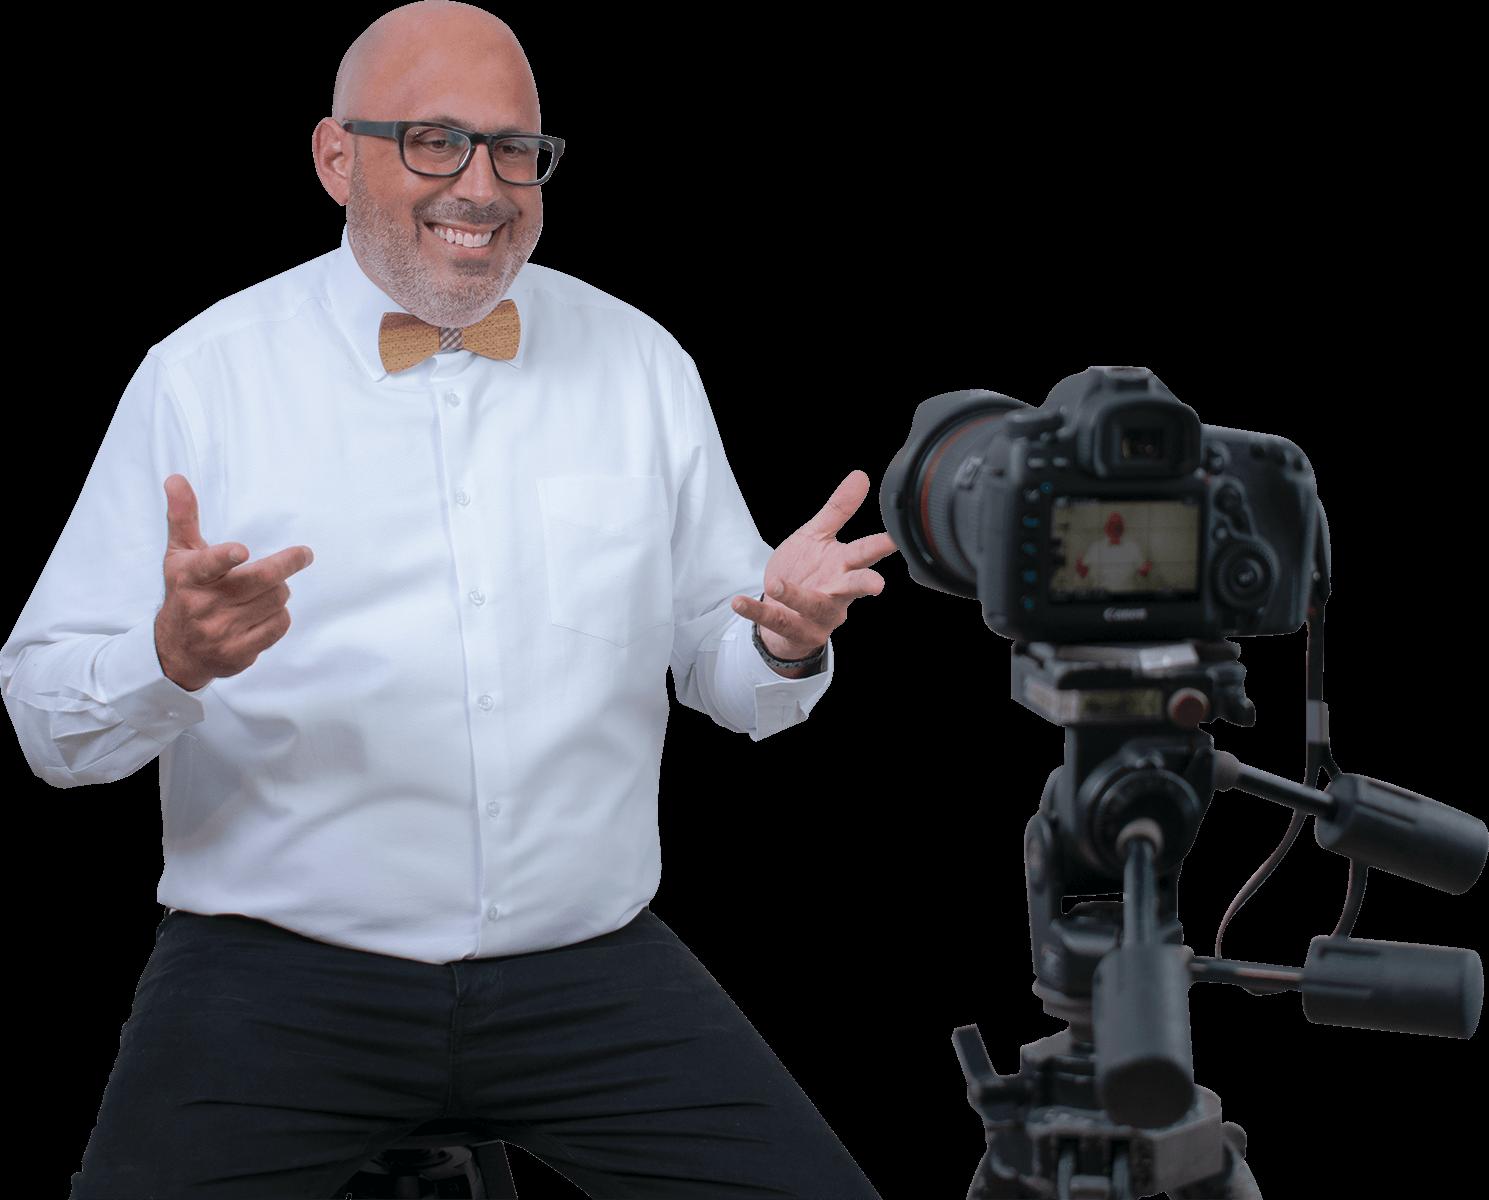 Dr. Derek Greenfield online motivational speaker